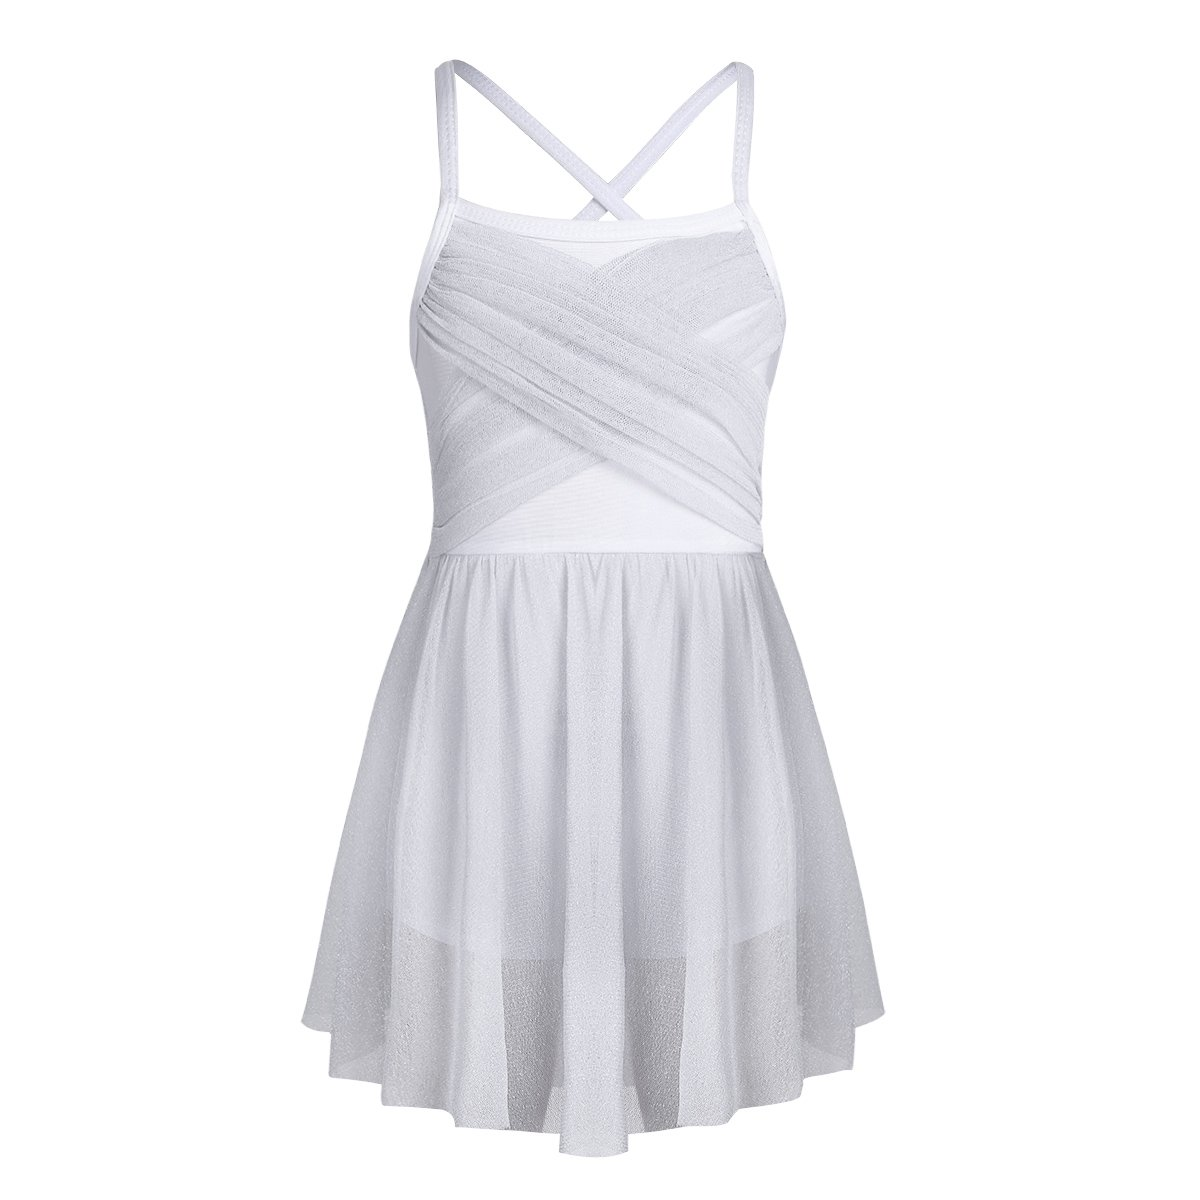 YiZYiF ホワイト DRESS ガールズ B07DVR34V7 ホワイト 8 B07DVR34V7 8, vivaストアー:97b2cff0 --- ijpba.info